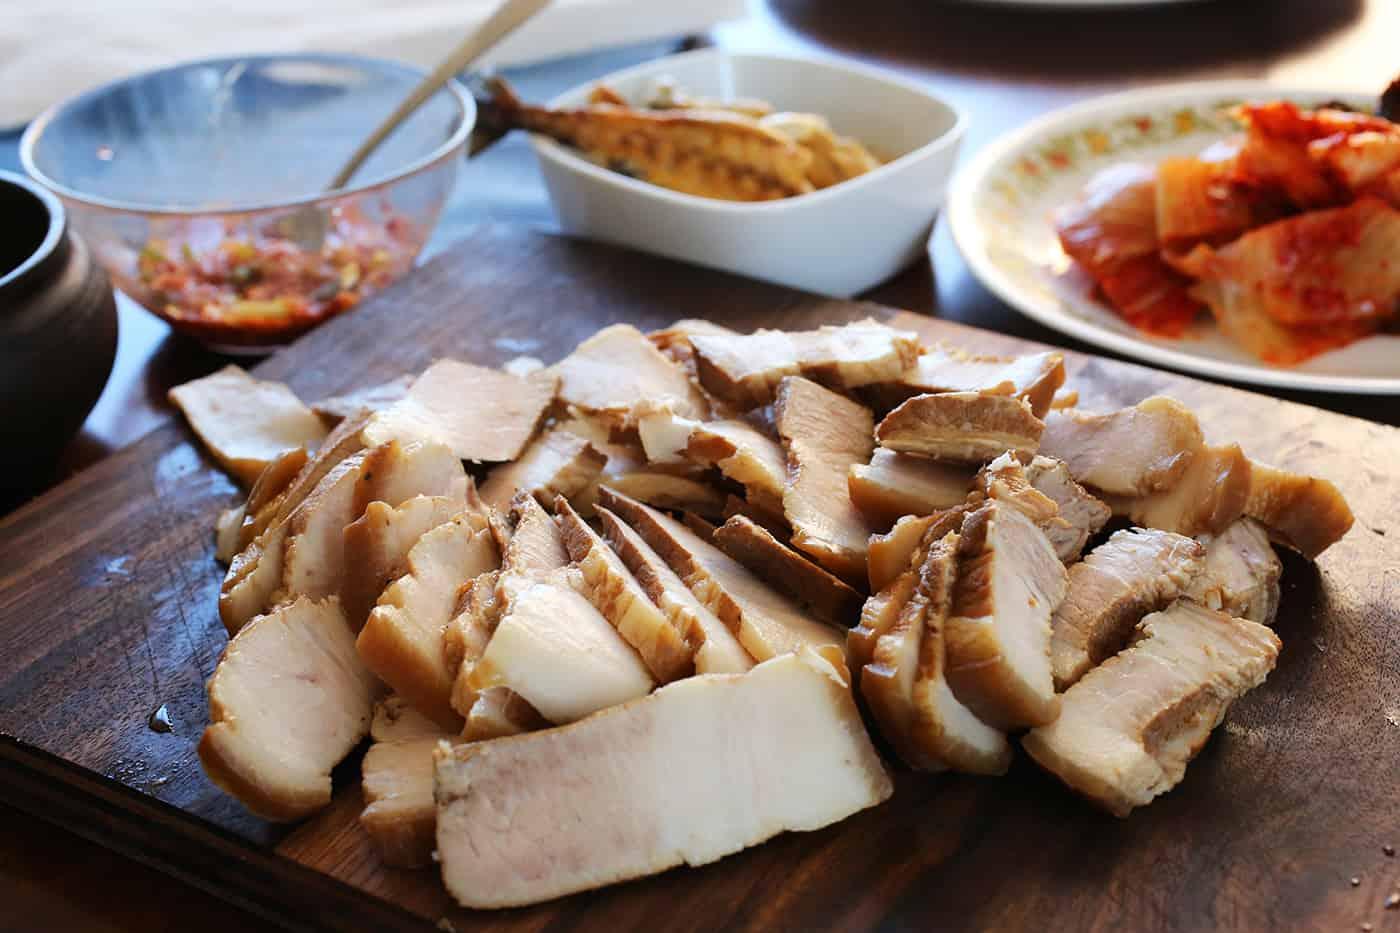 Pork wraps (Bo-ssam) recipe